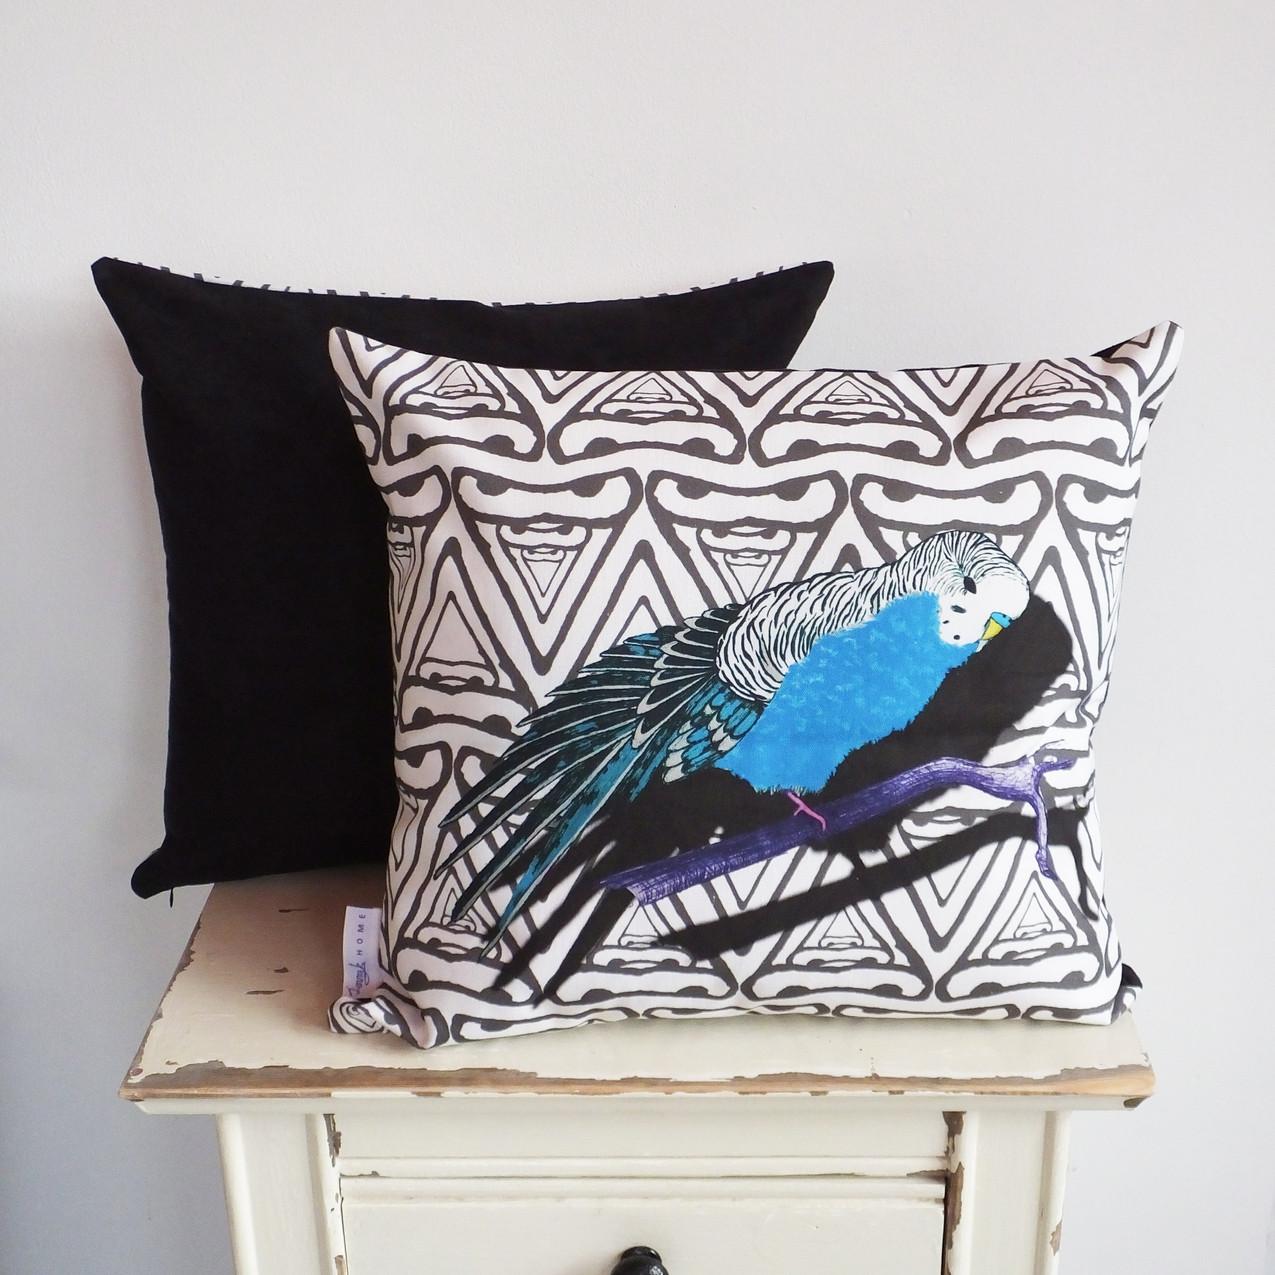 Geometric patterned budgie cushion